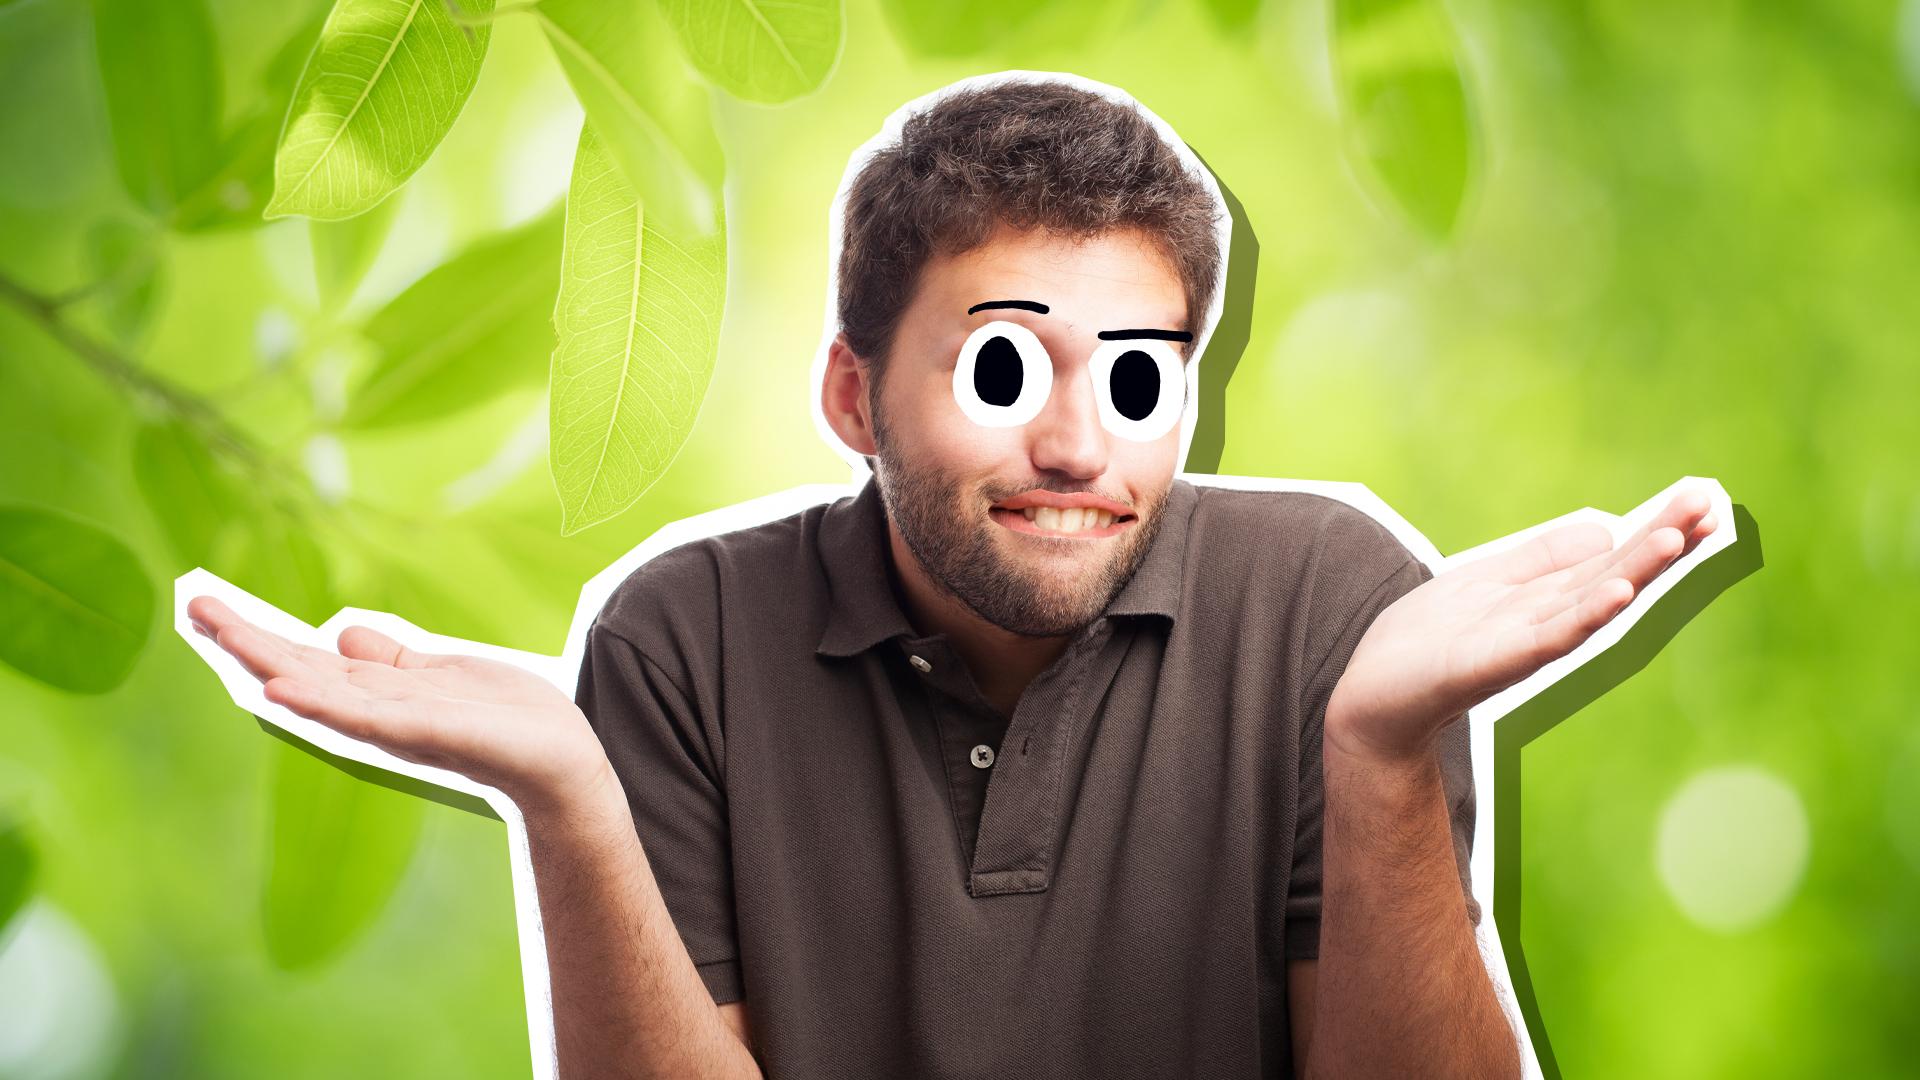 A man in a leafy garden